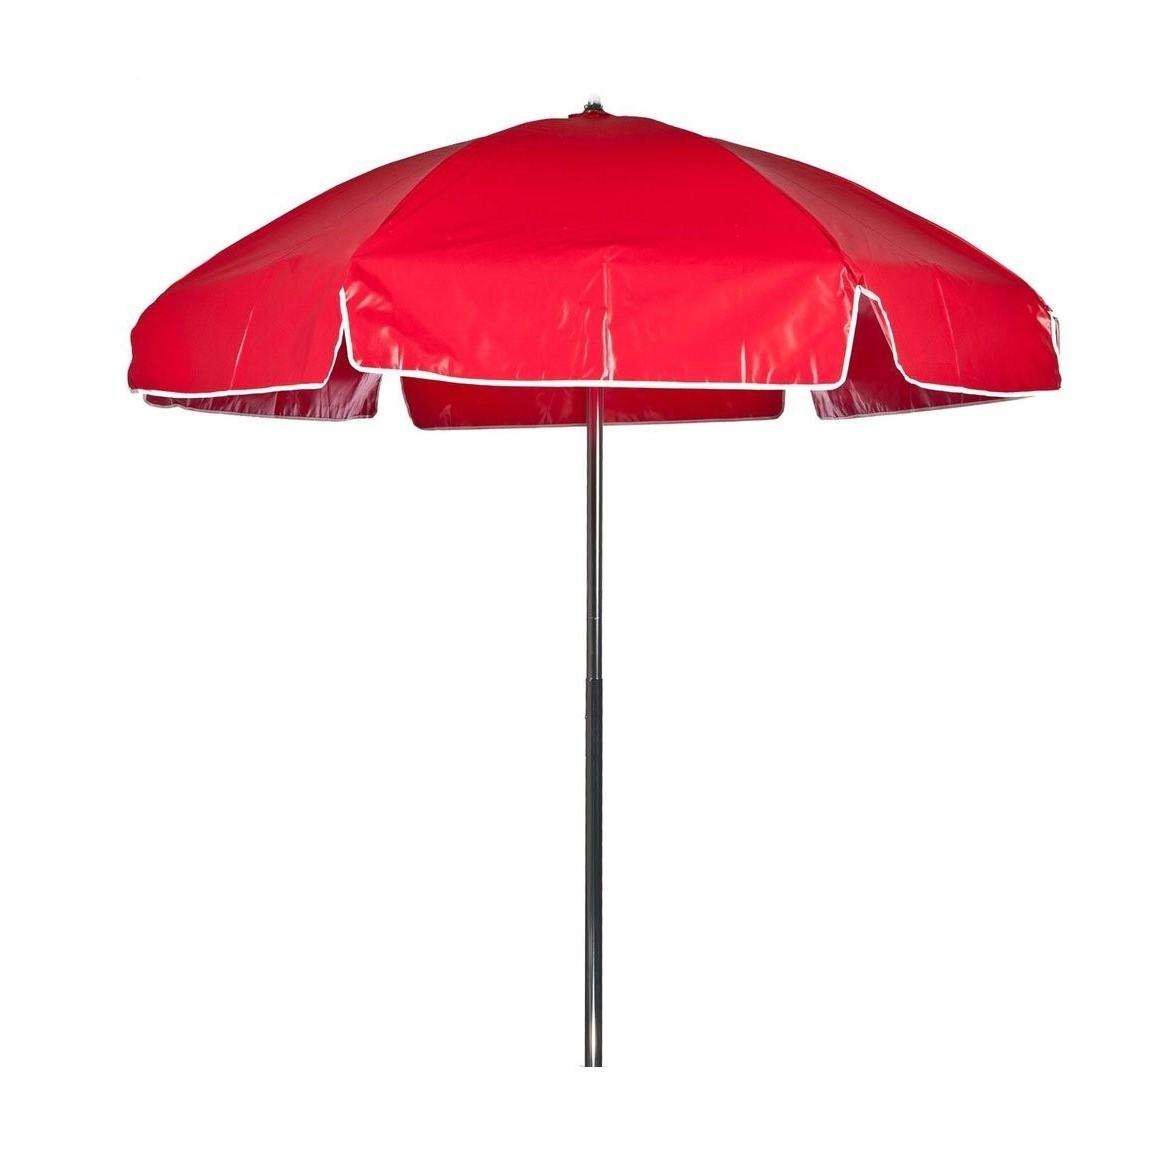 Vinyl Patio Umbrellas Throughout Preferred Red Vinyl Lifeguard Umbrella – Tilt Greateststores (Gallery 20 of 20)